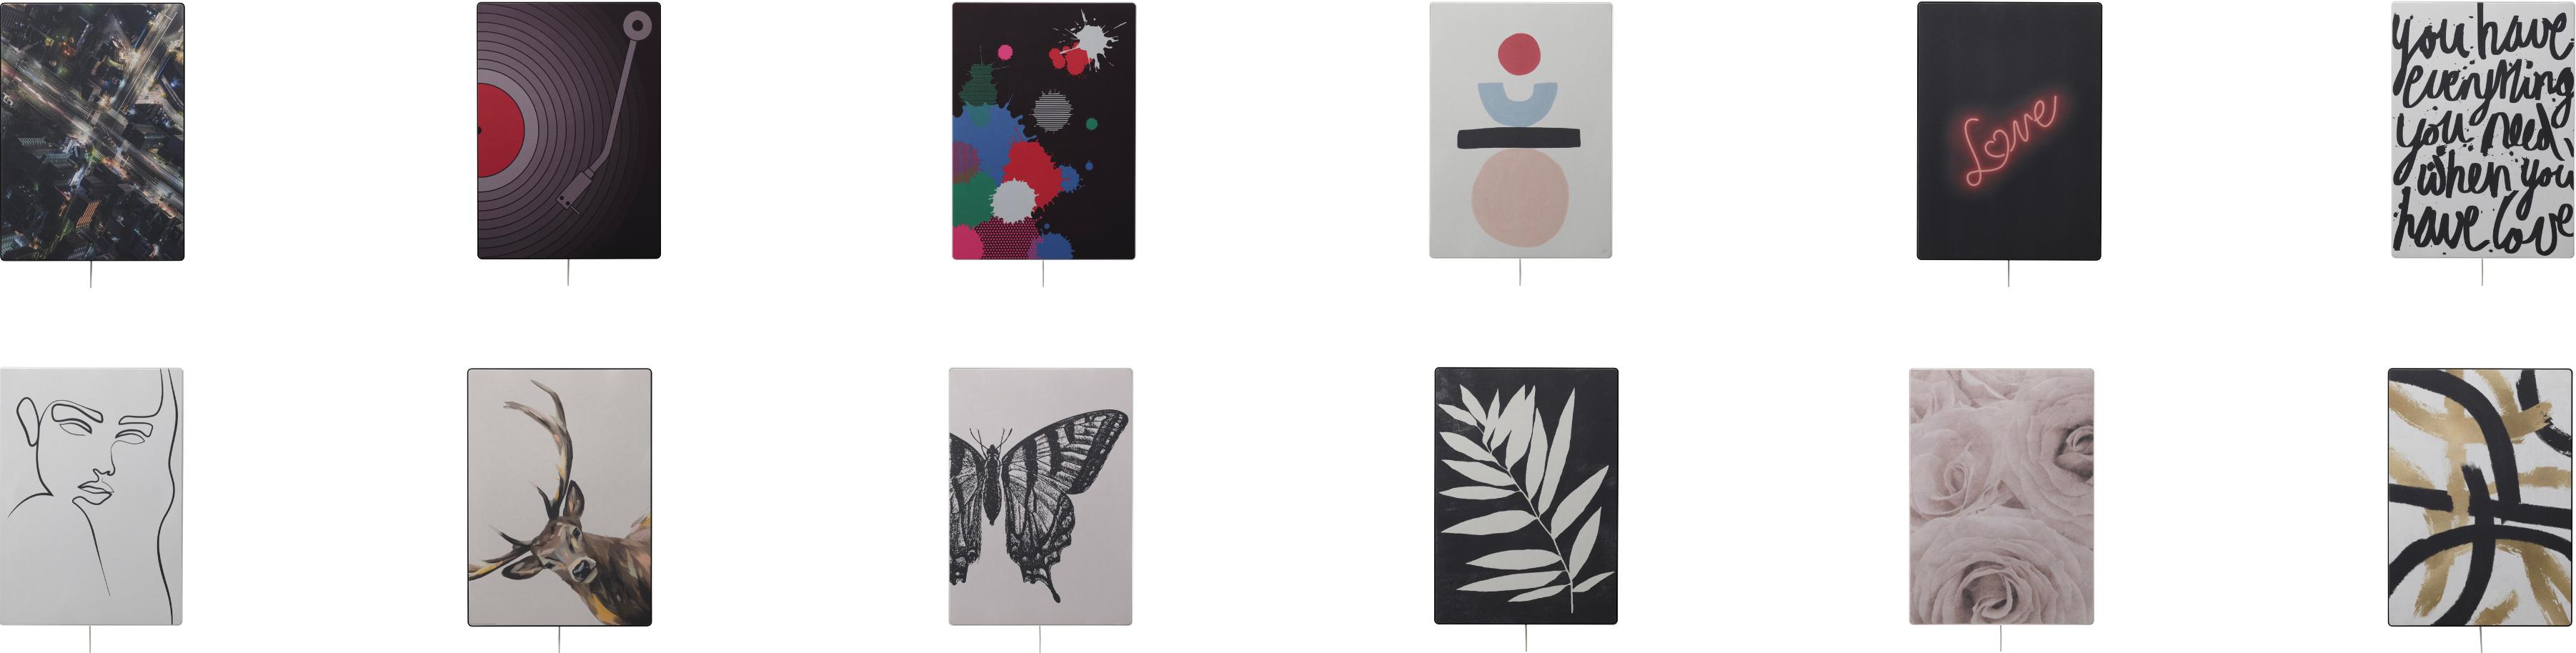 Alle Panel-Designs zum SYMFONISK Bilderrahmen